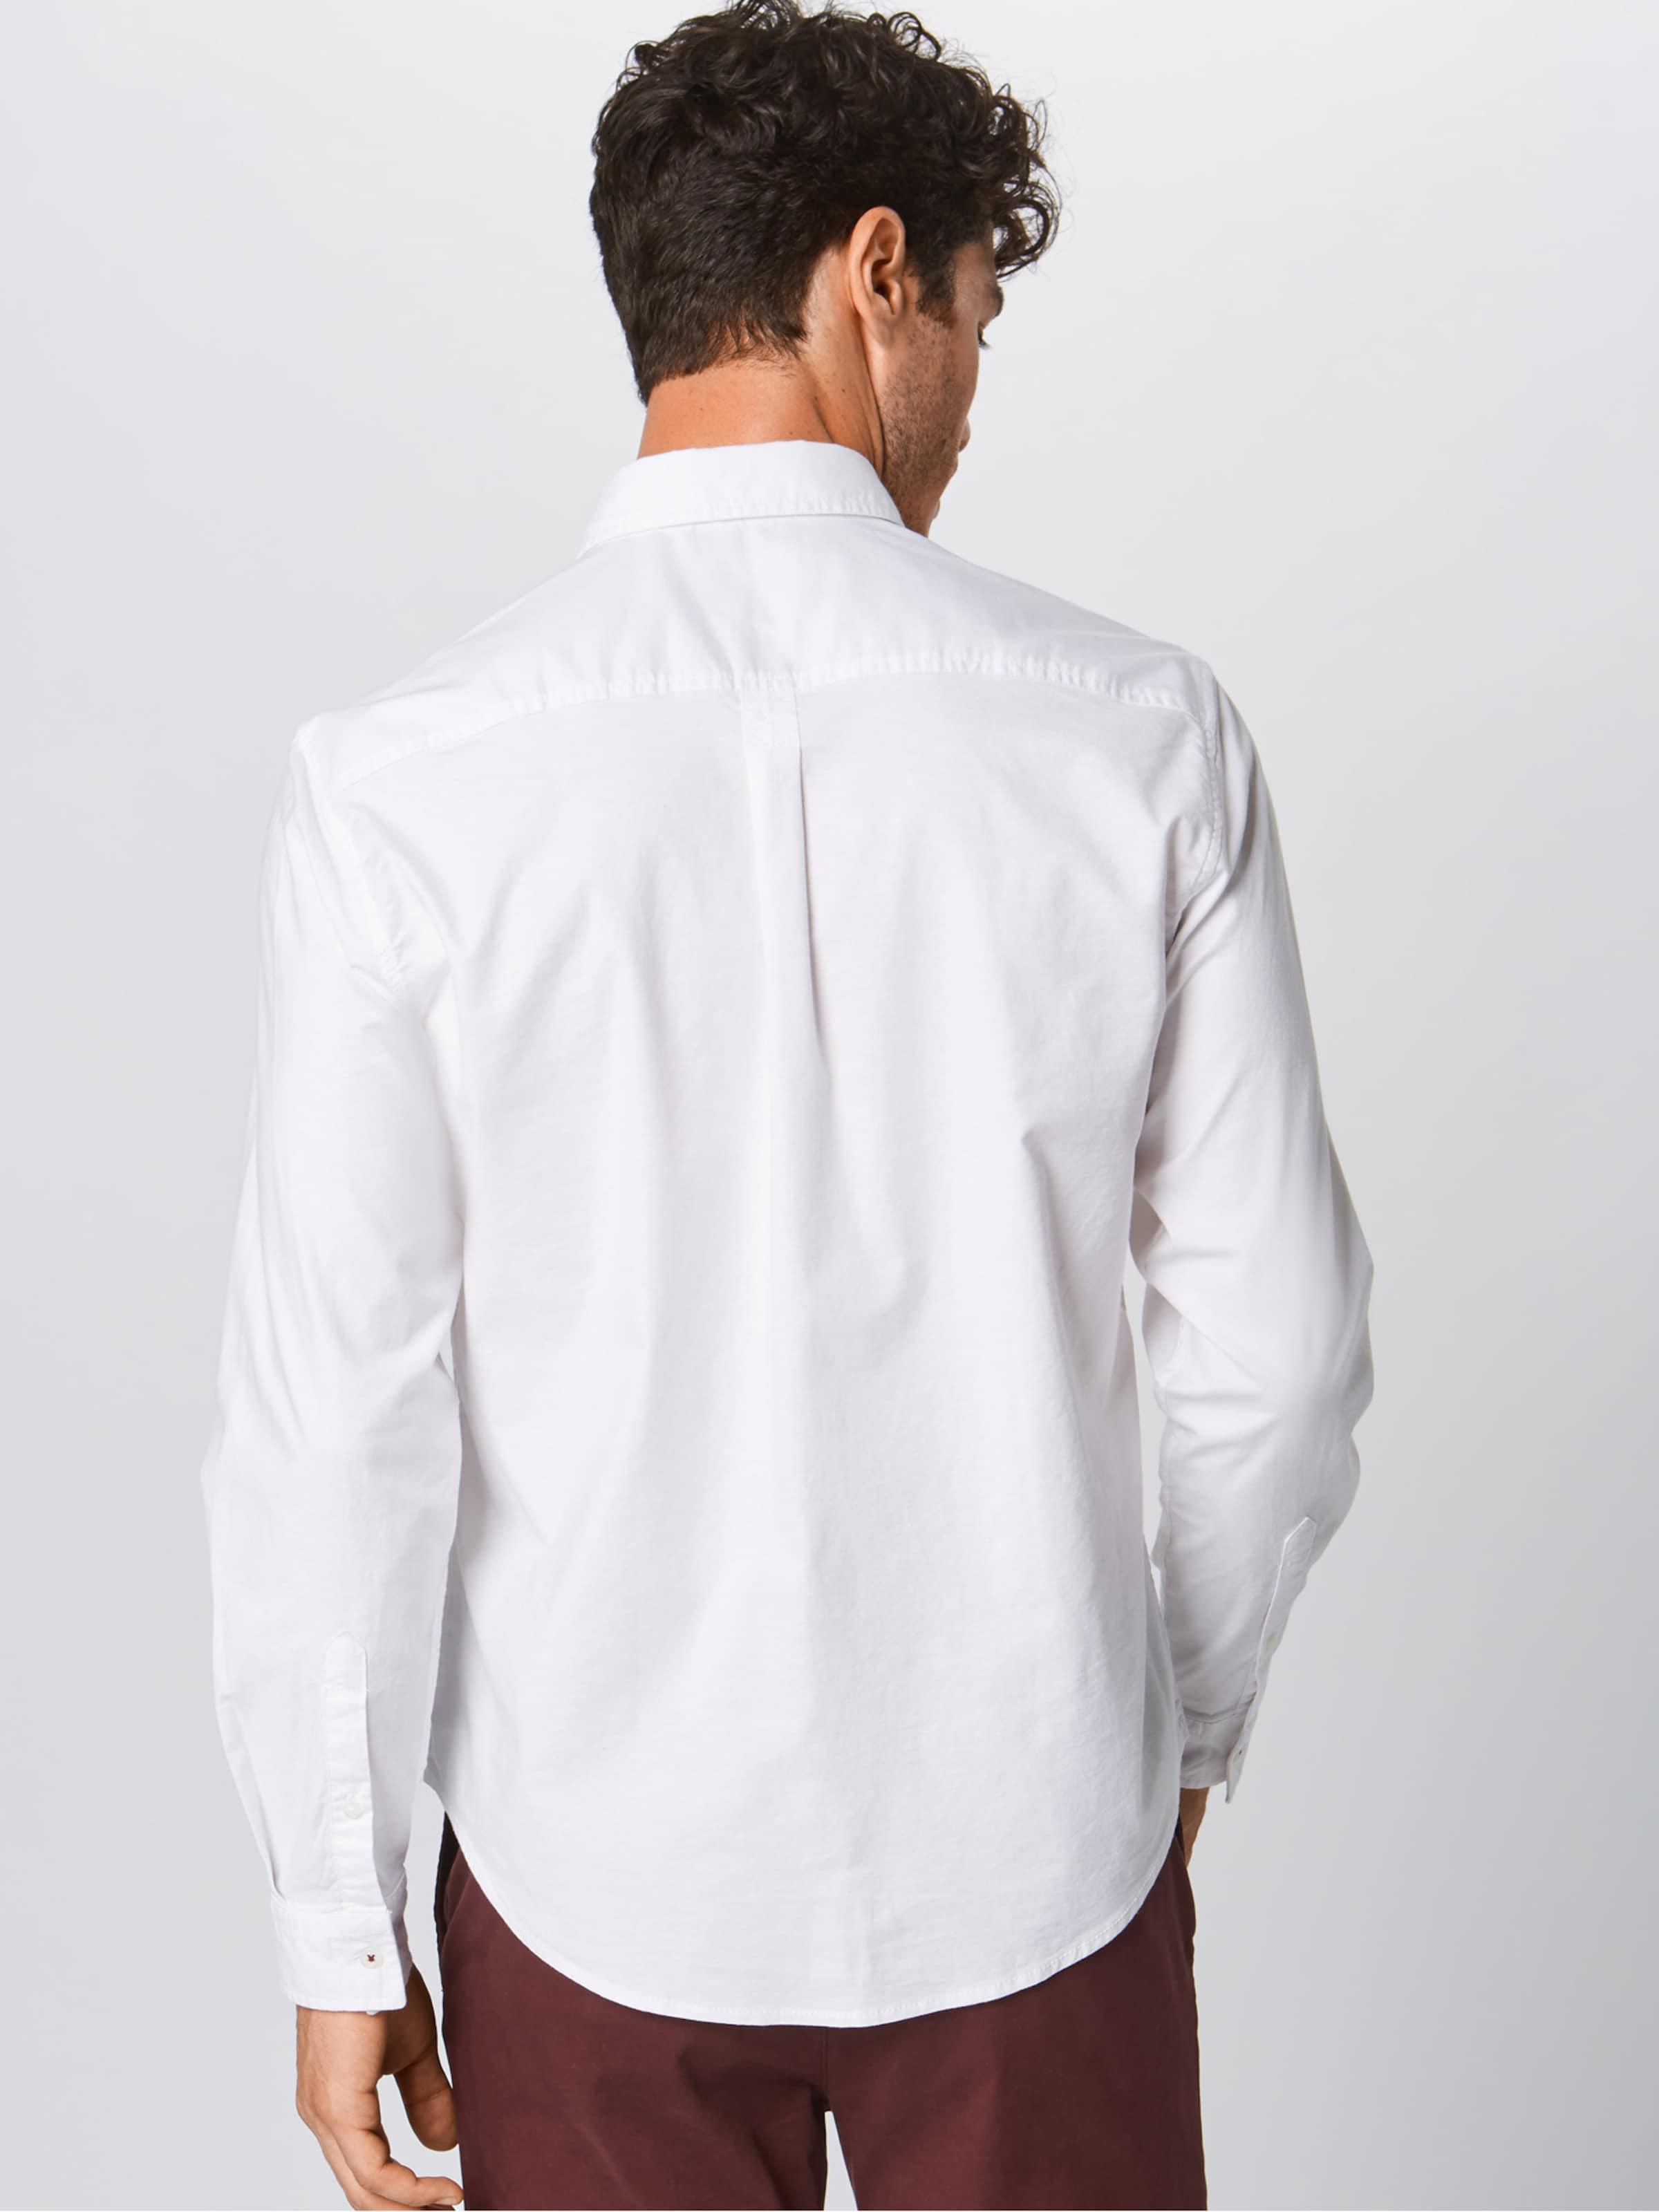 Oxfd 'f En By Edc ' Esprit Business Blanc Chemise Solid lcF1uK3TJ